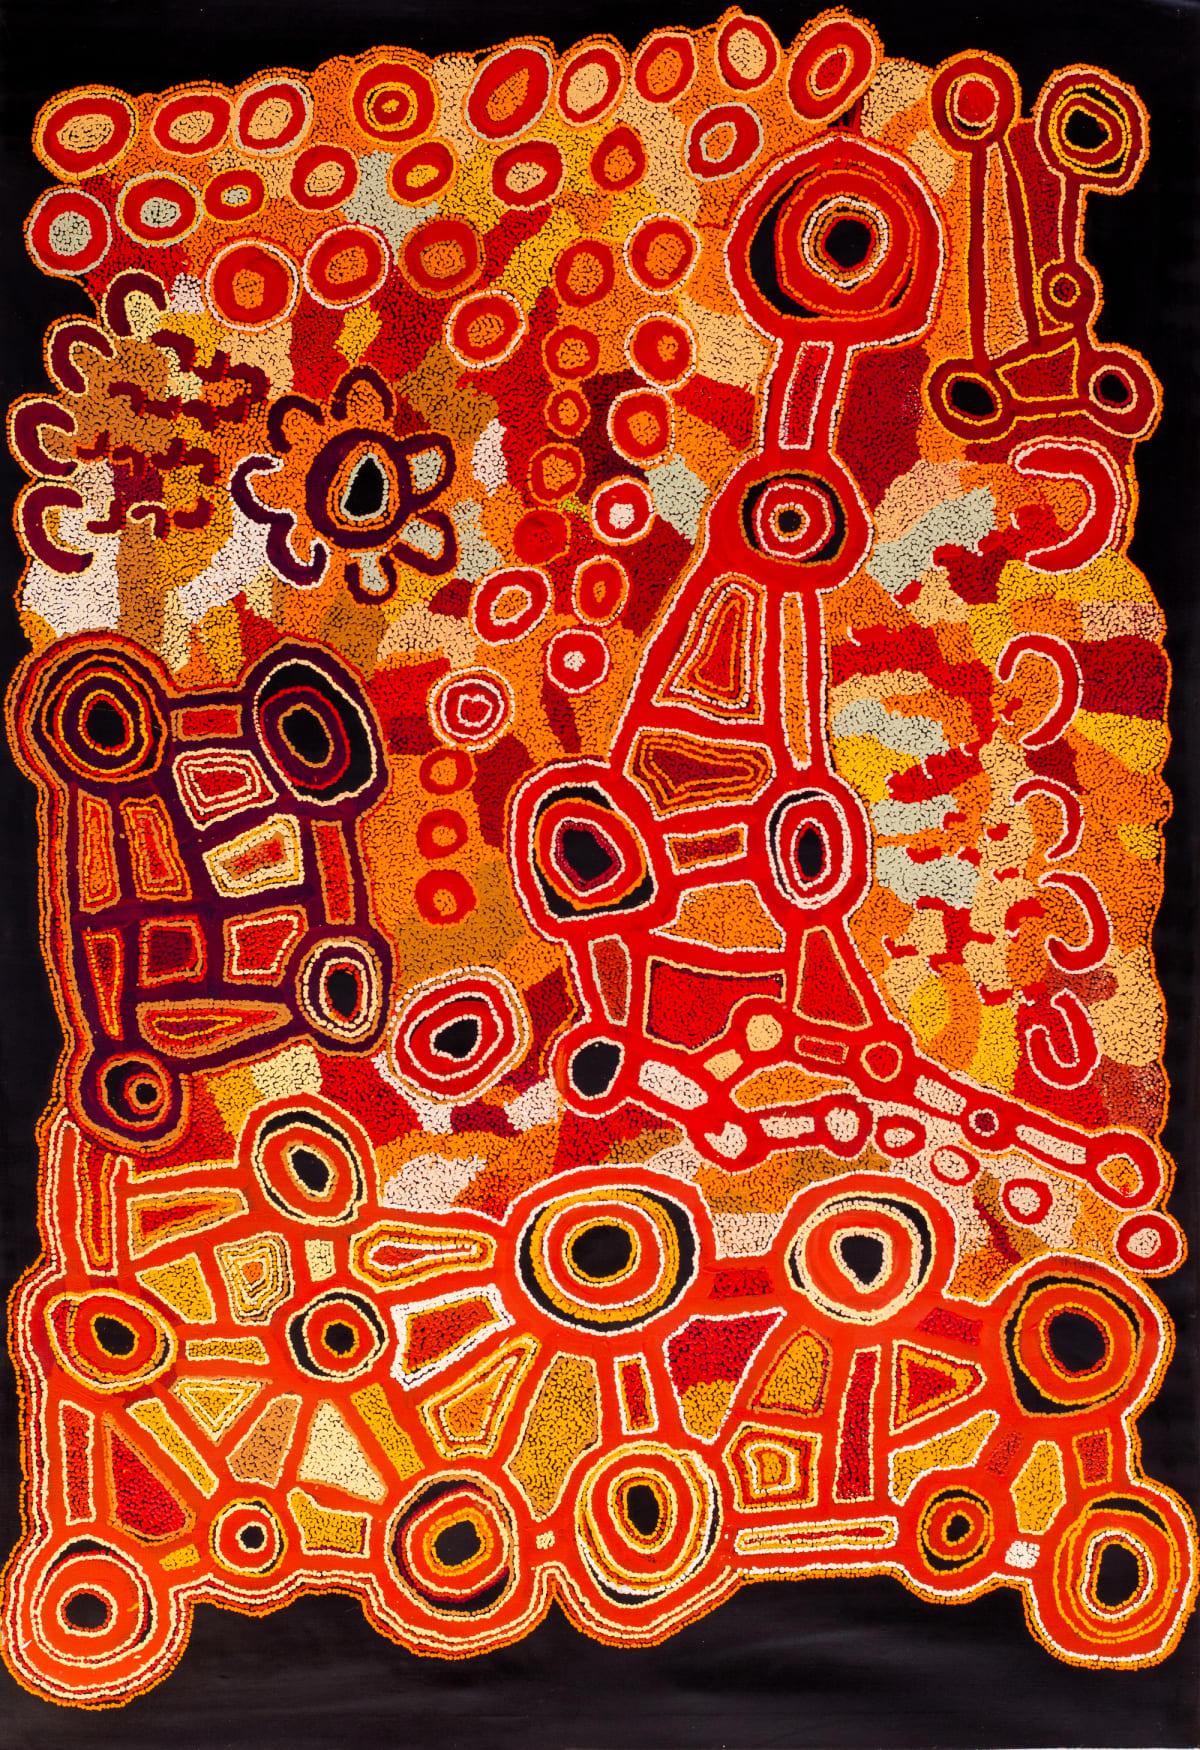 Ngalpingka Simms Wayiyul, 2019 Acrylic on linen 200 x 137 cm